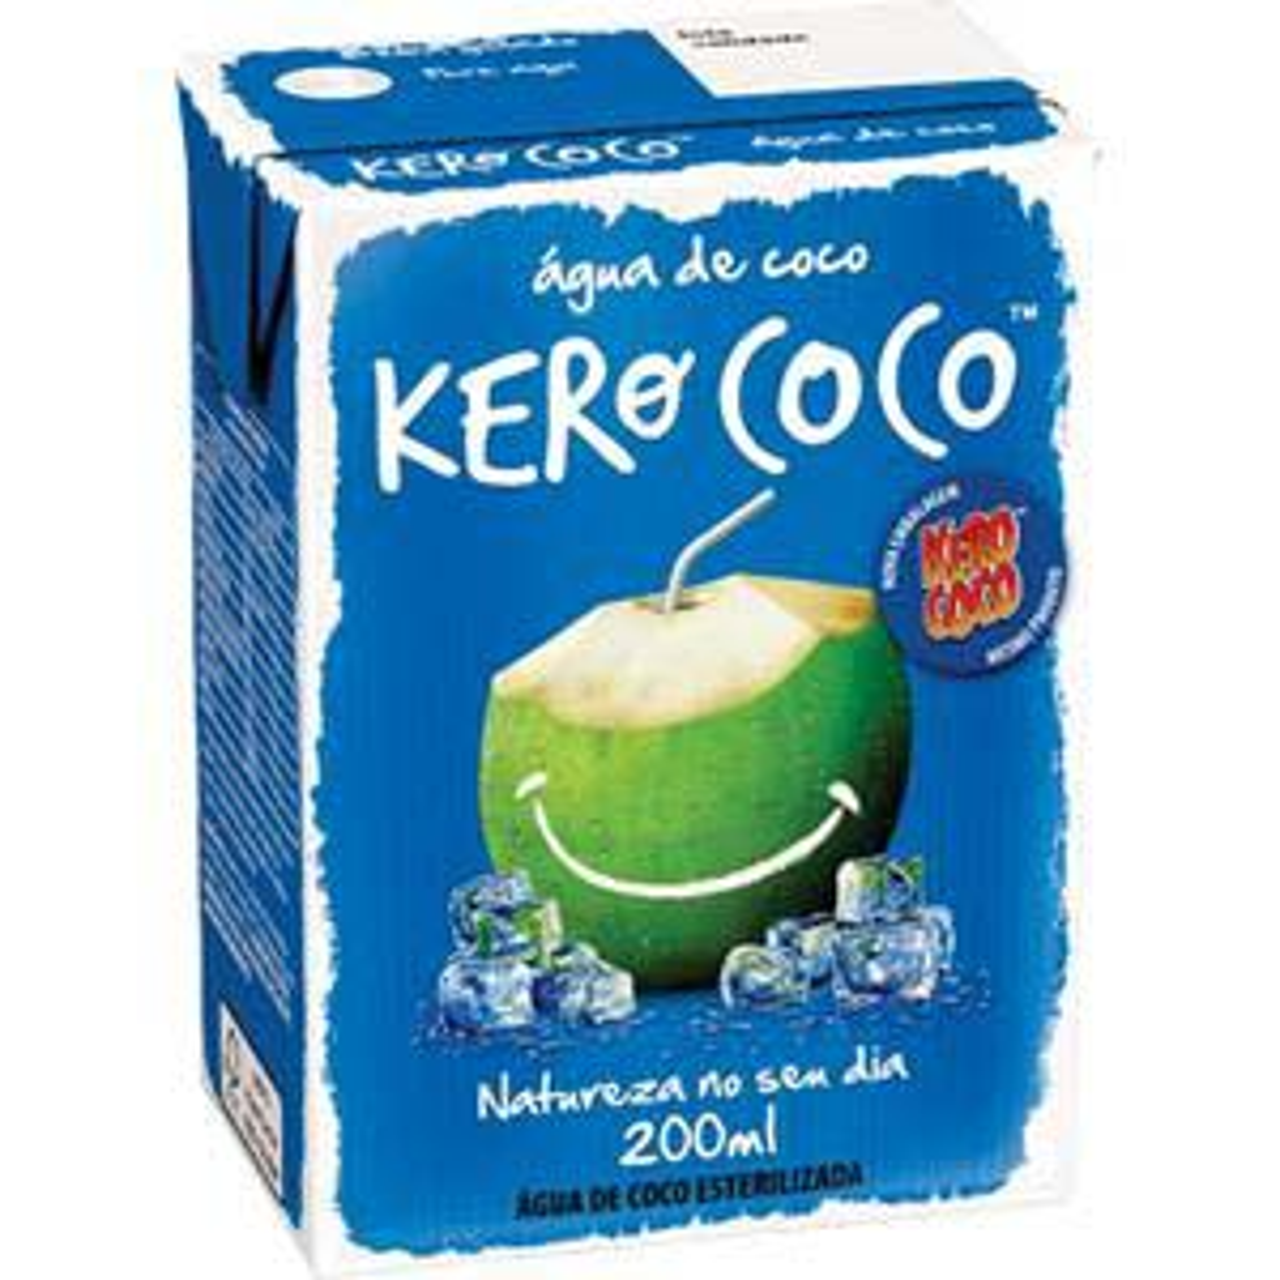 ÁGUA DE COCO KERO COCO TP 200 ML